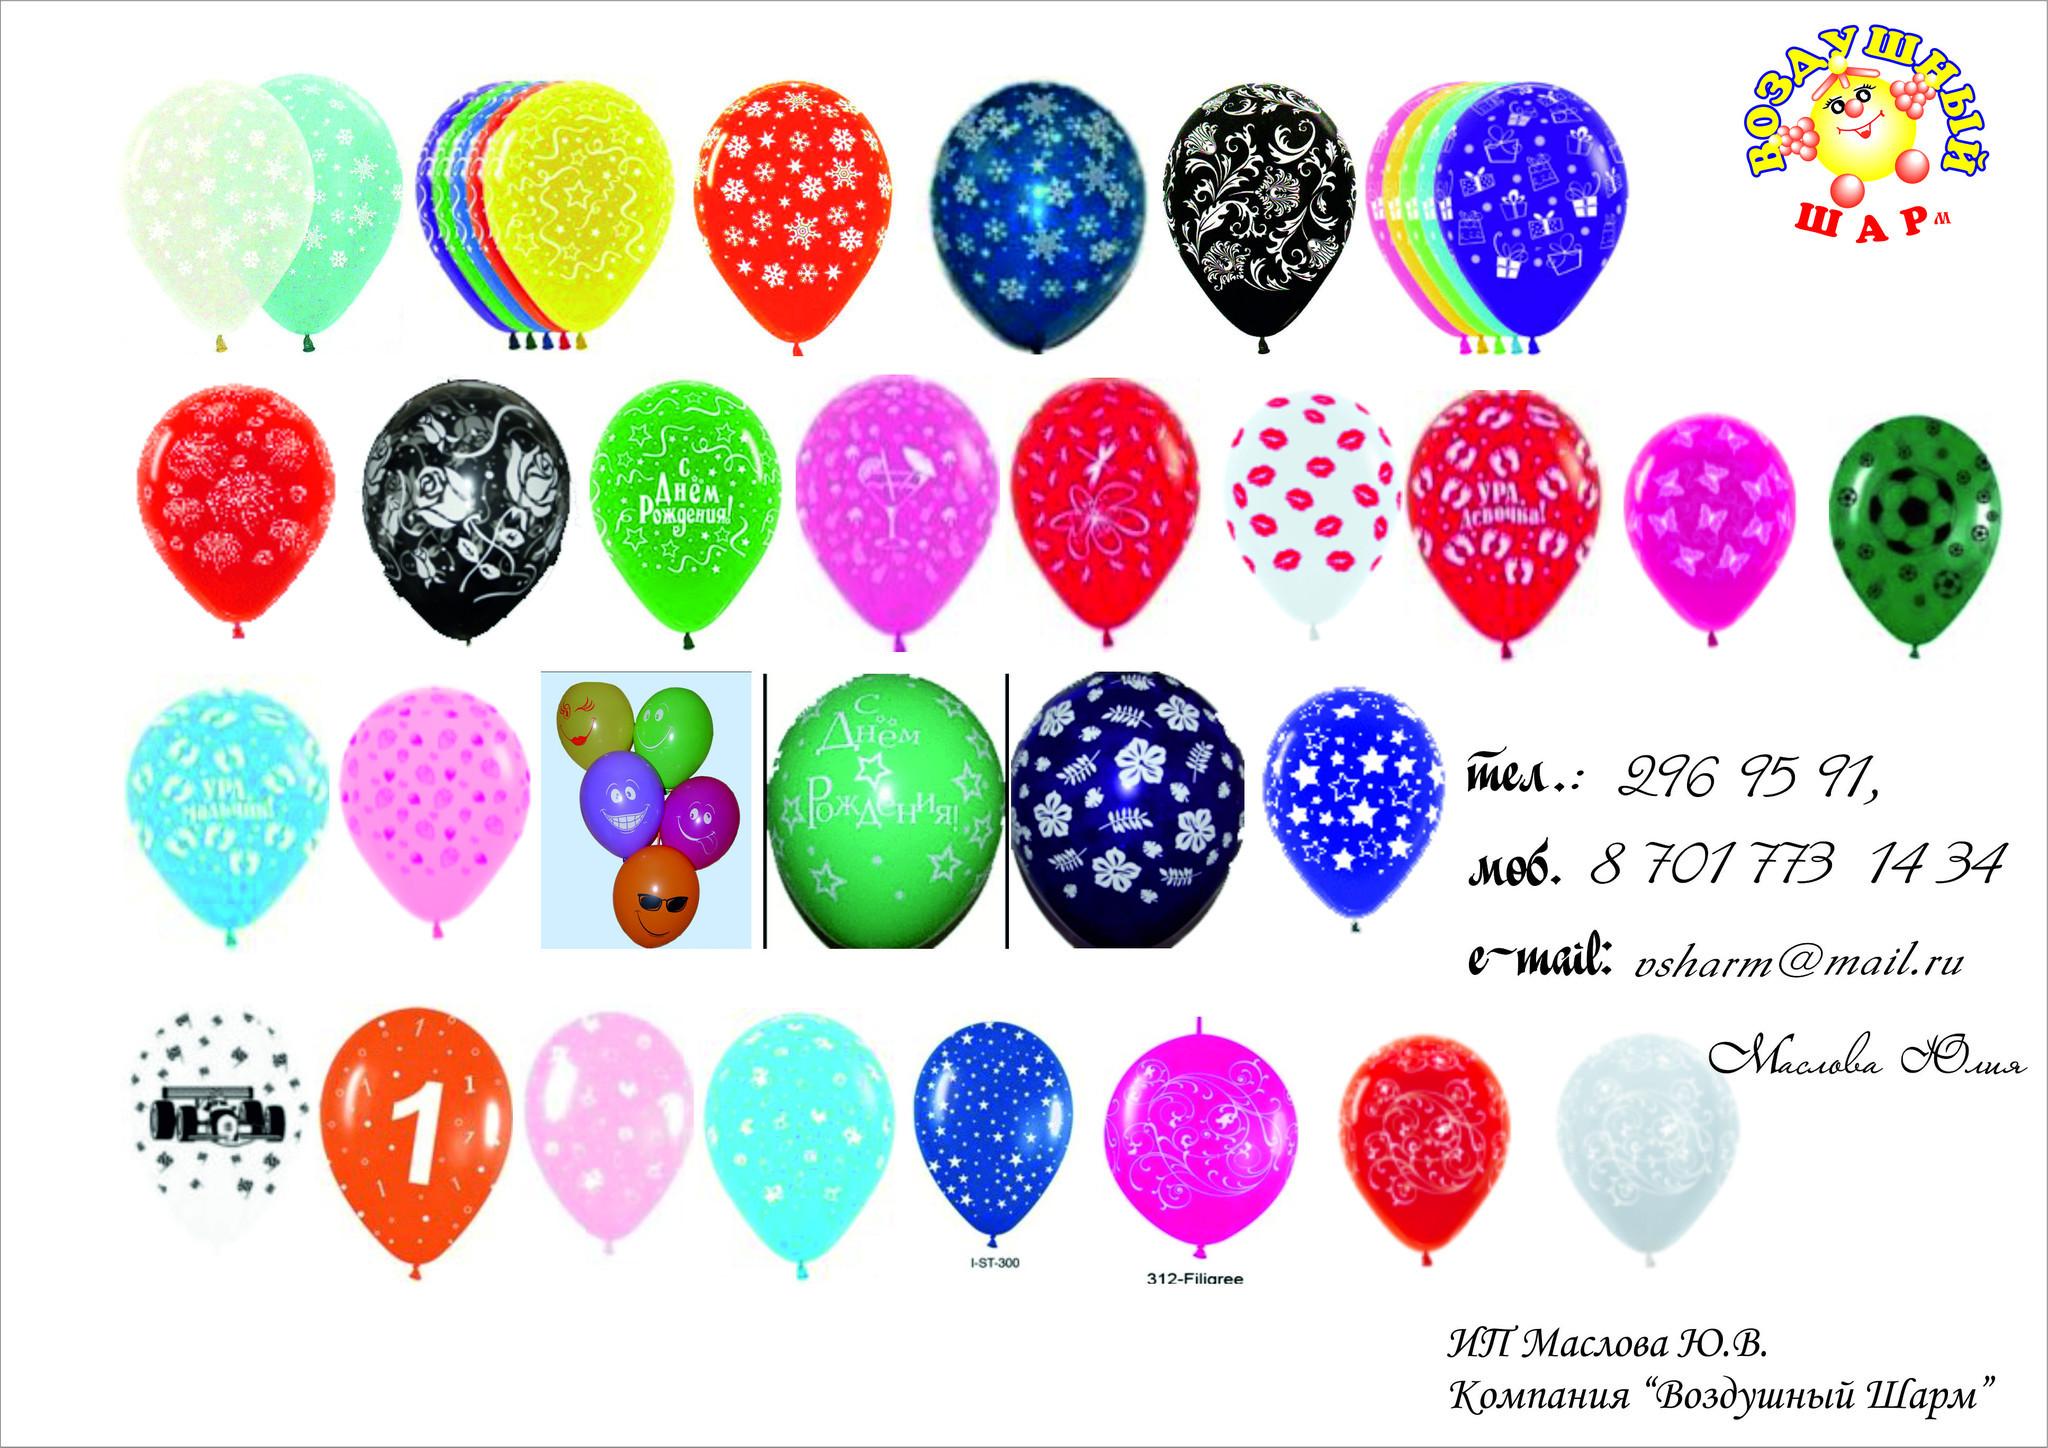 шары с рисунком Алматы.jpg